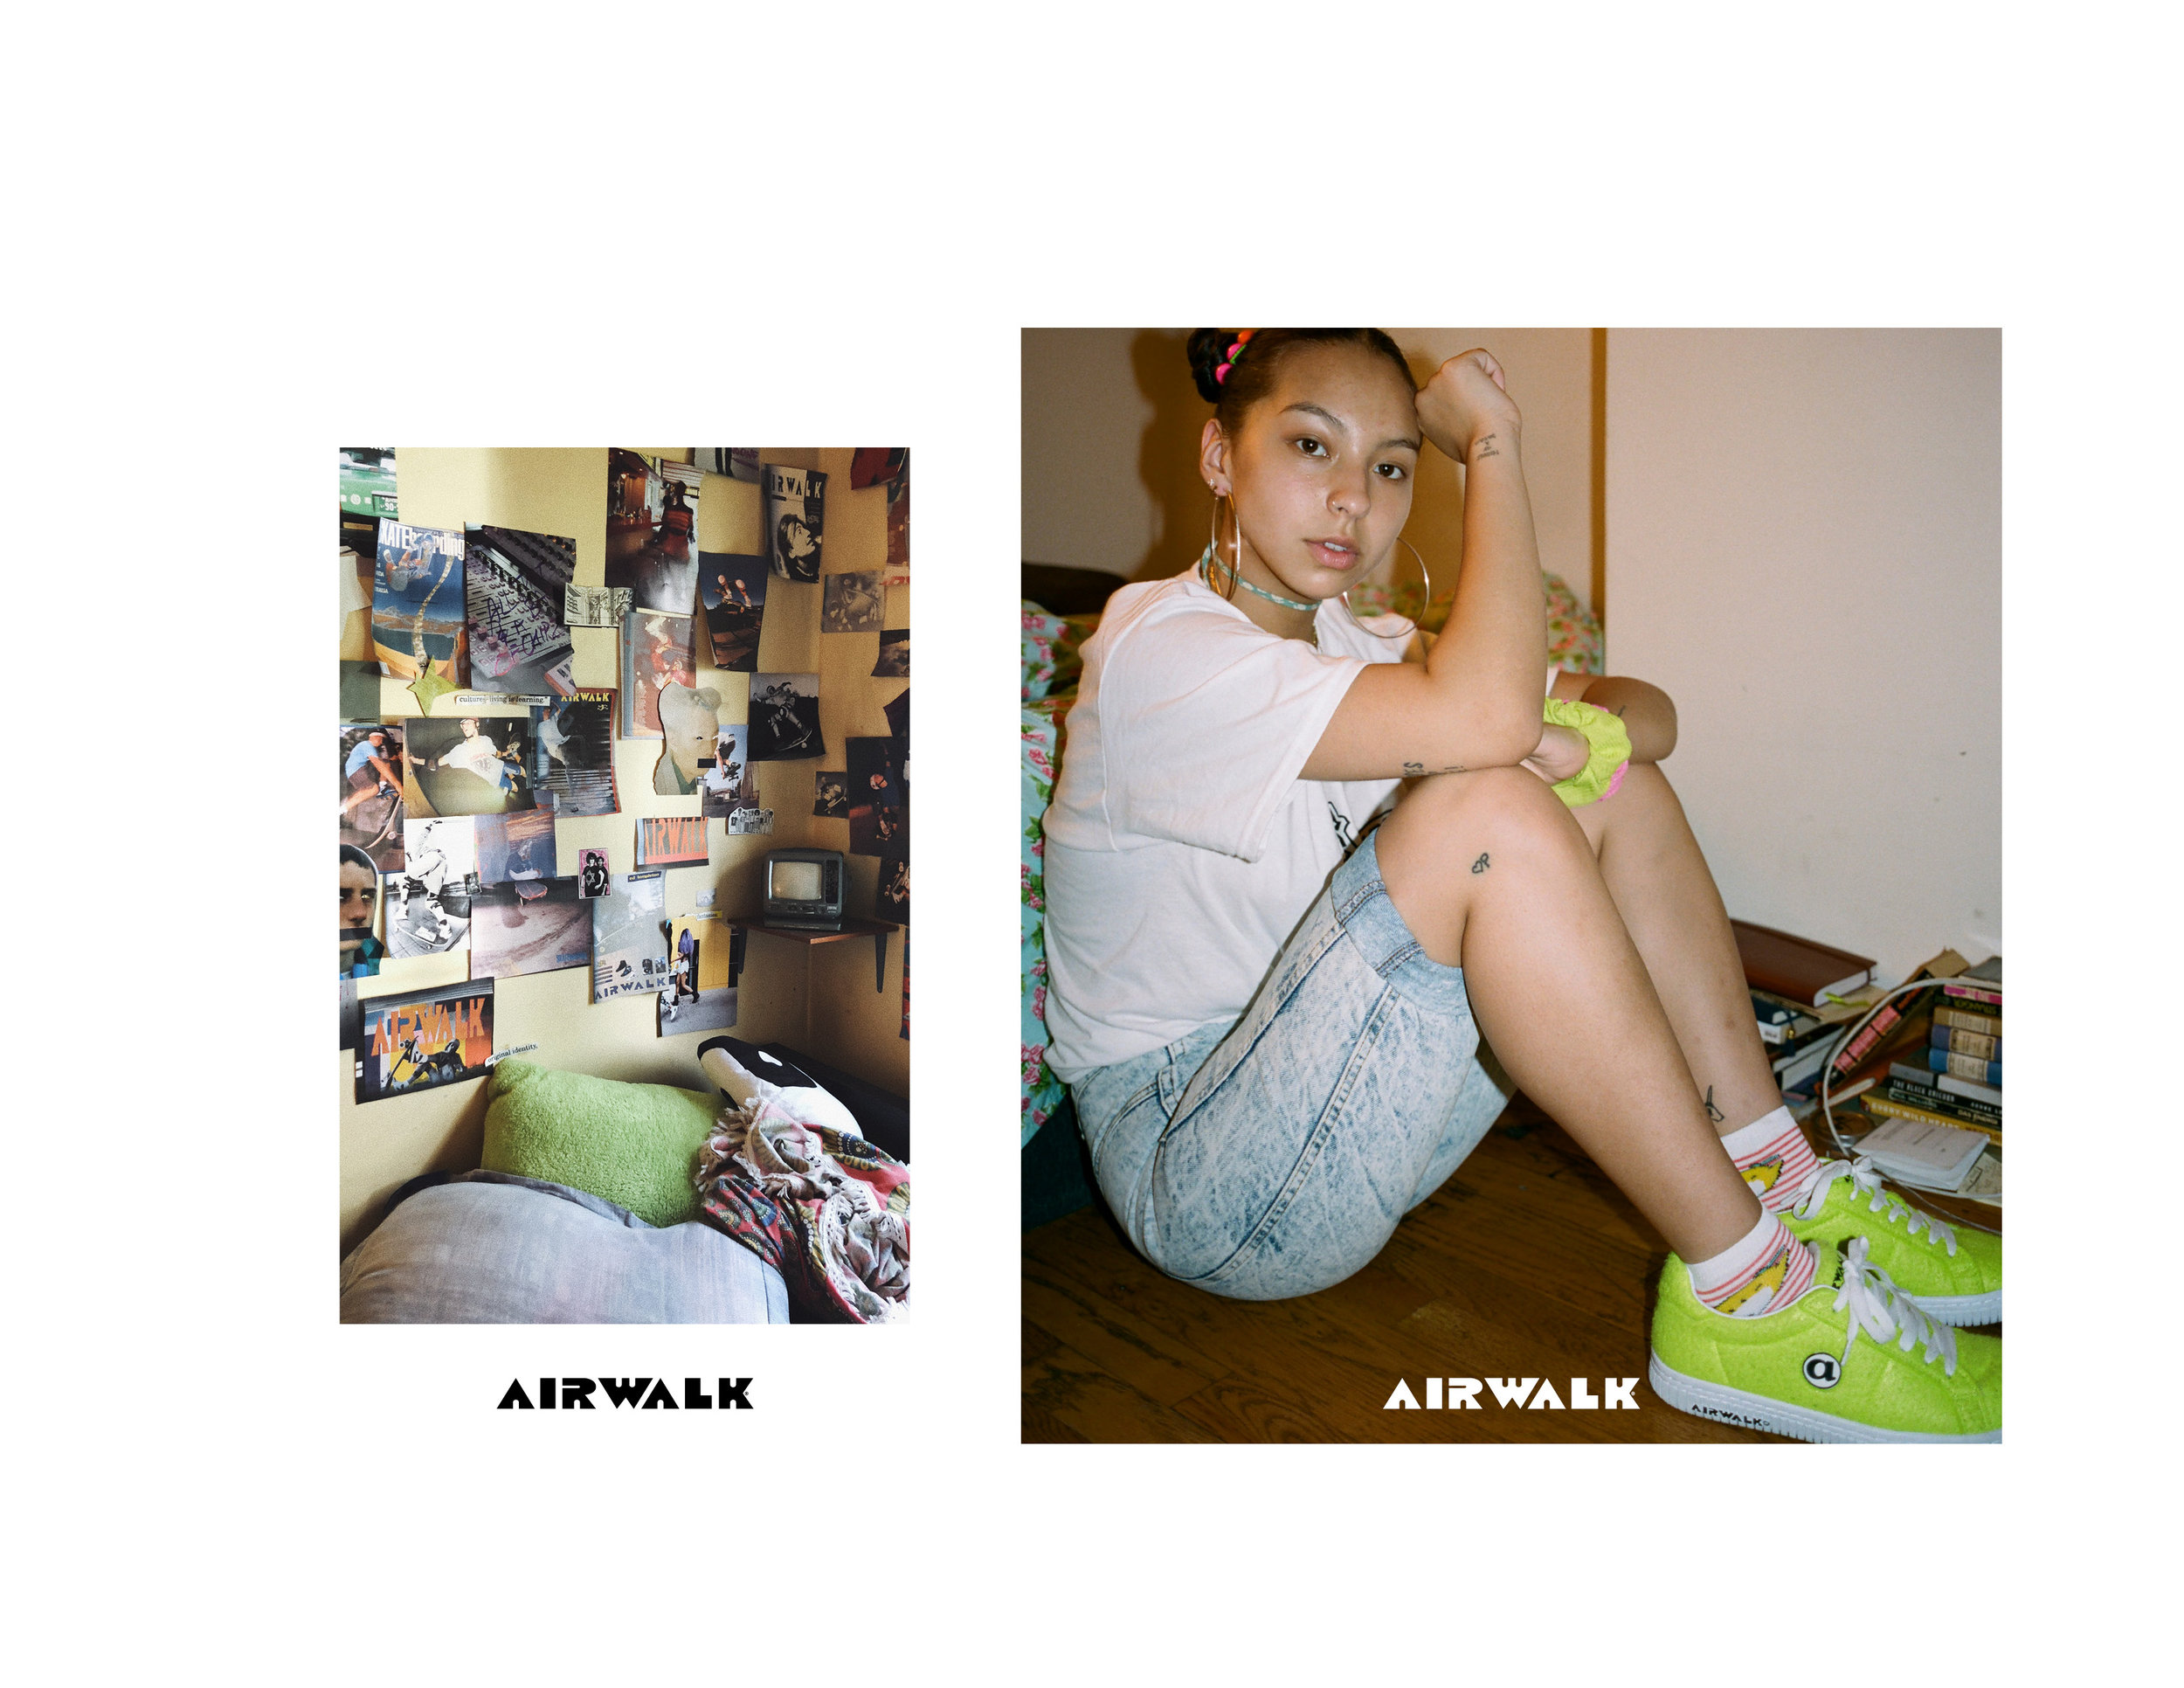 AWK_IMAGE_GUIDELINES7.jpg